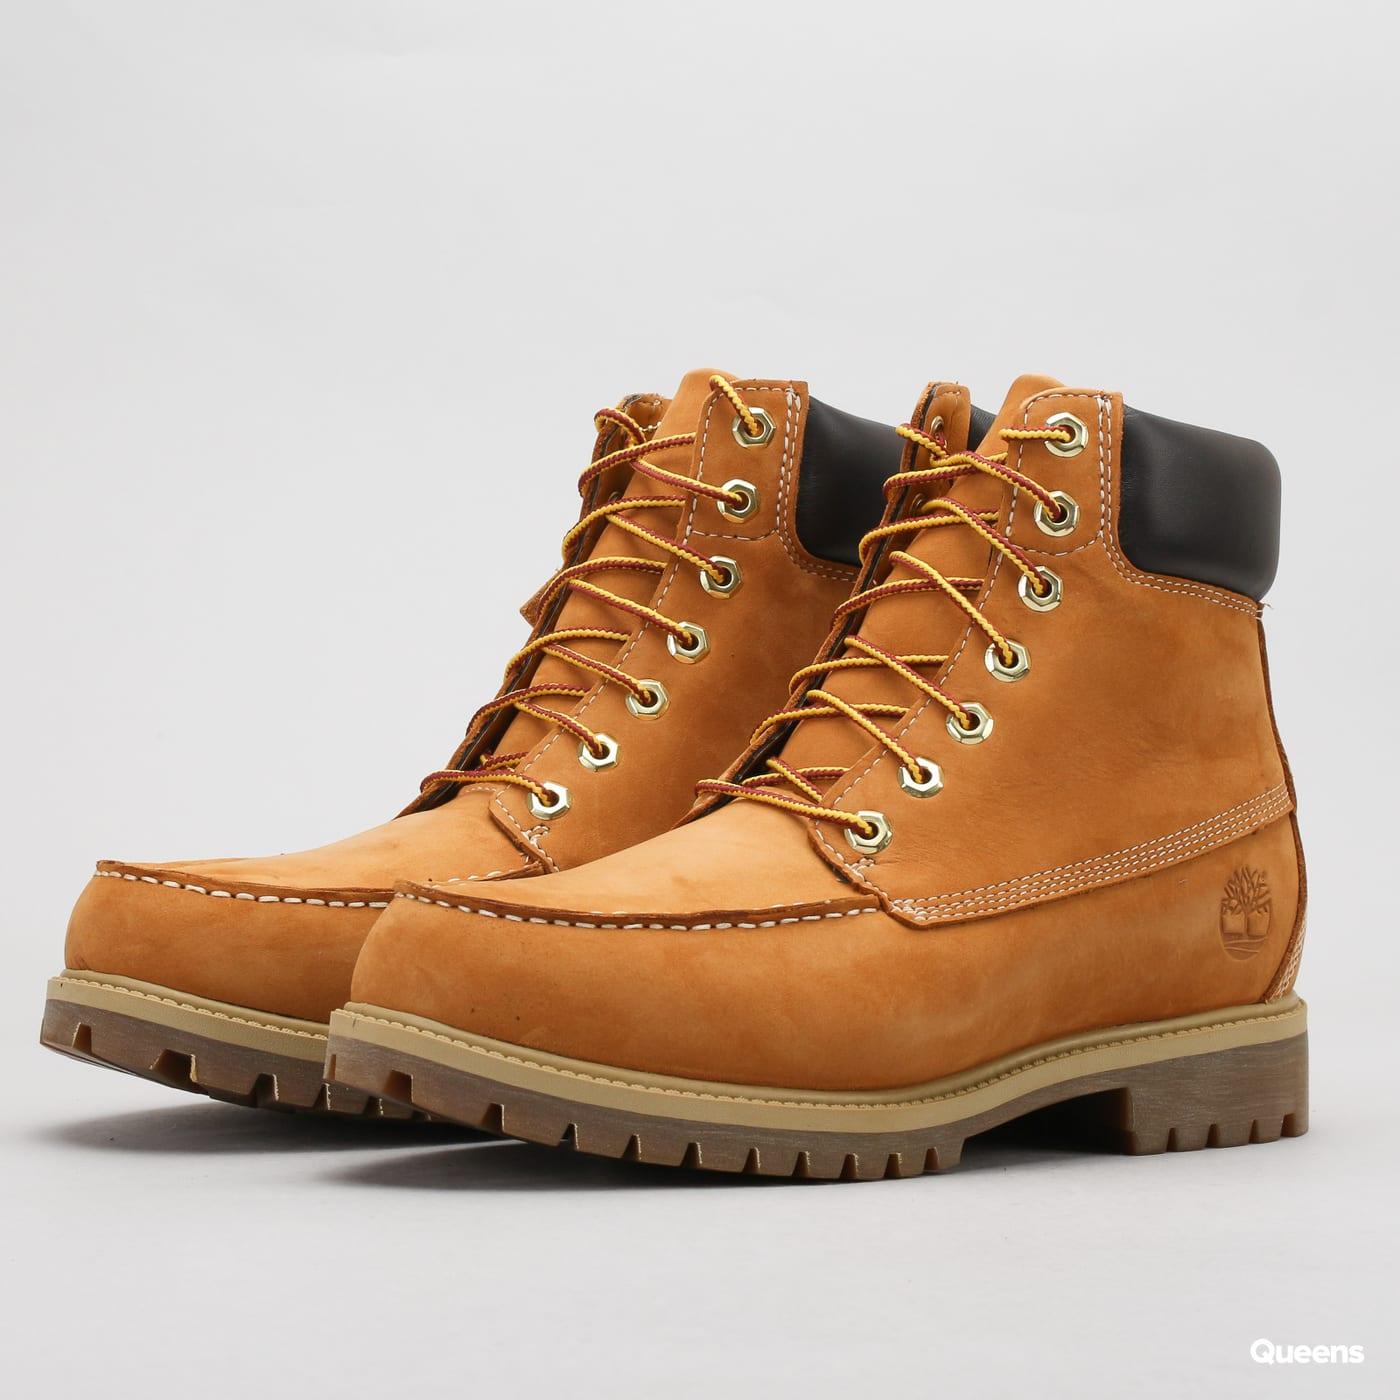 8d1fd0642e Pánské zimní boty Timberland 6 in Premium WP MT Boot (A1M8A-WHE) – Queens 💚